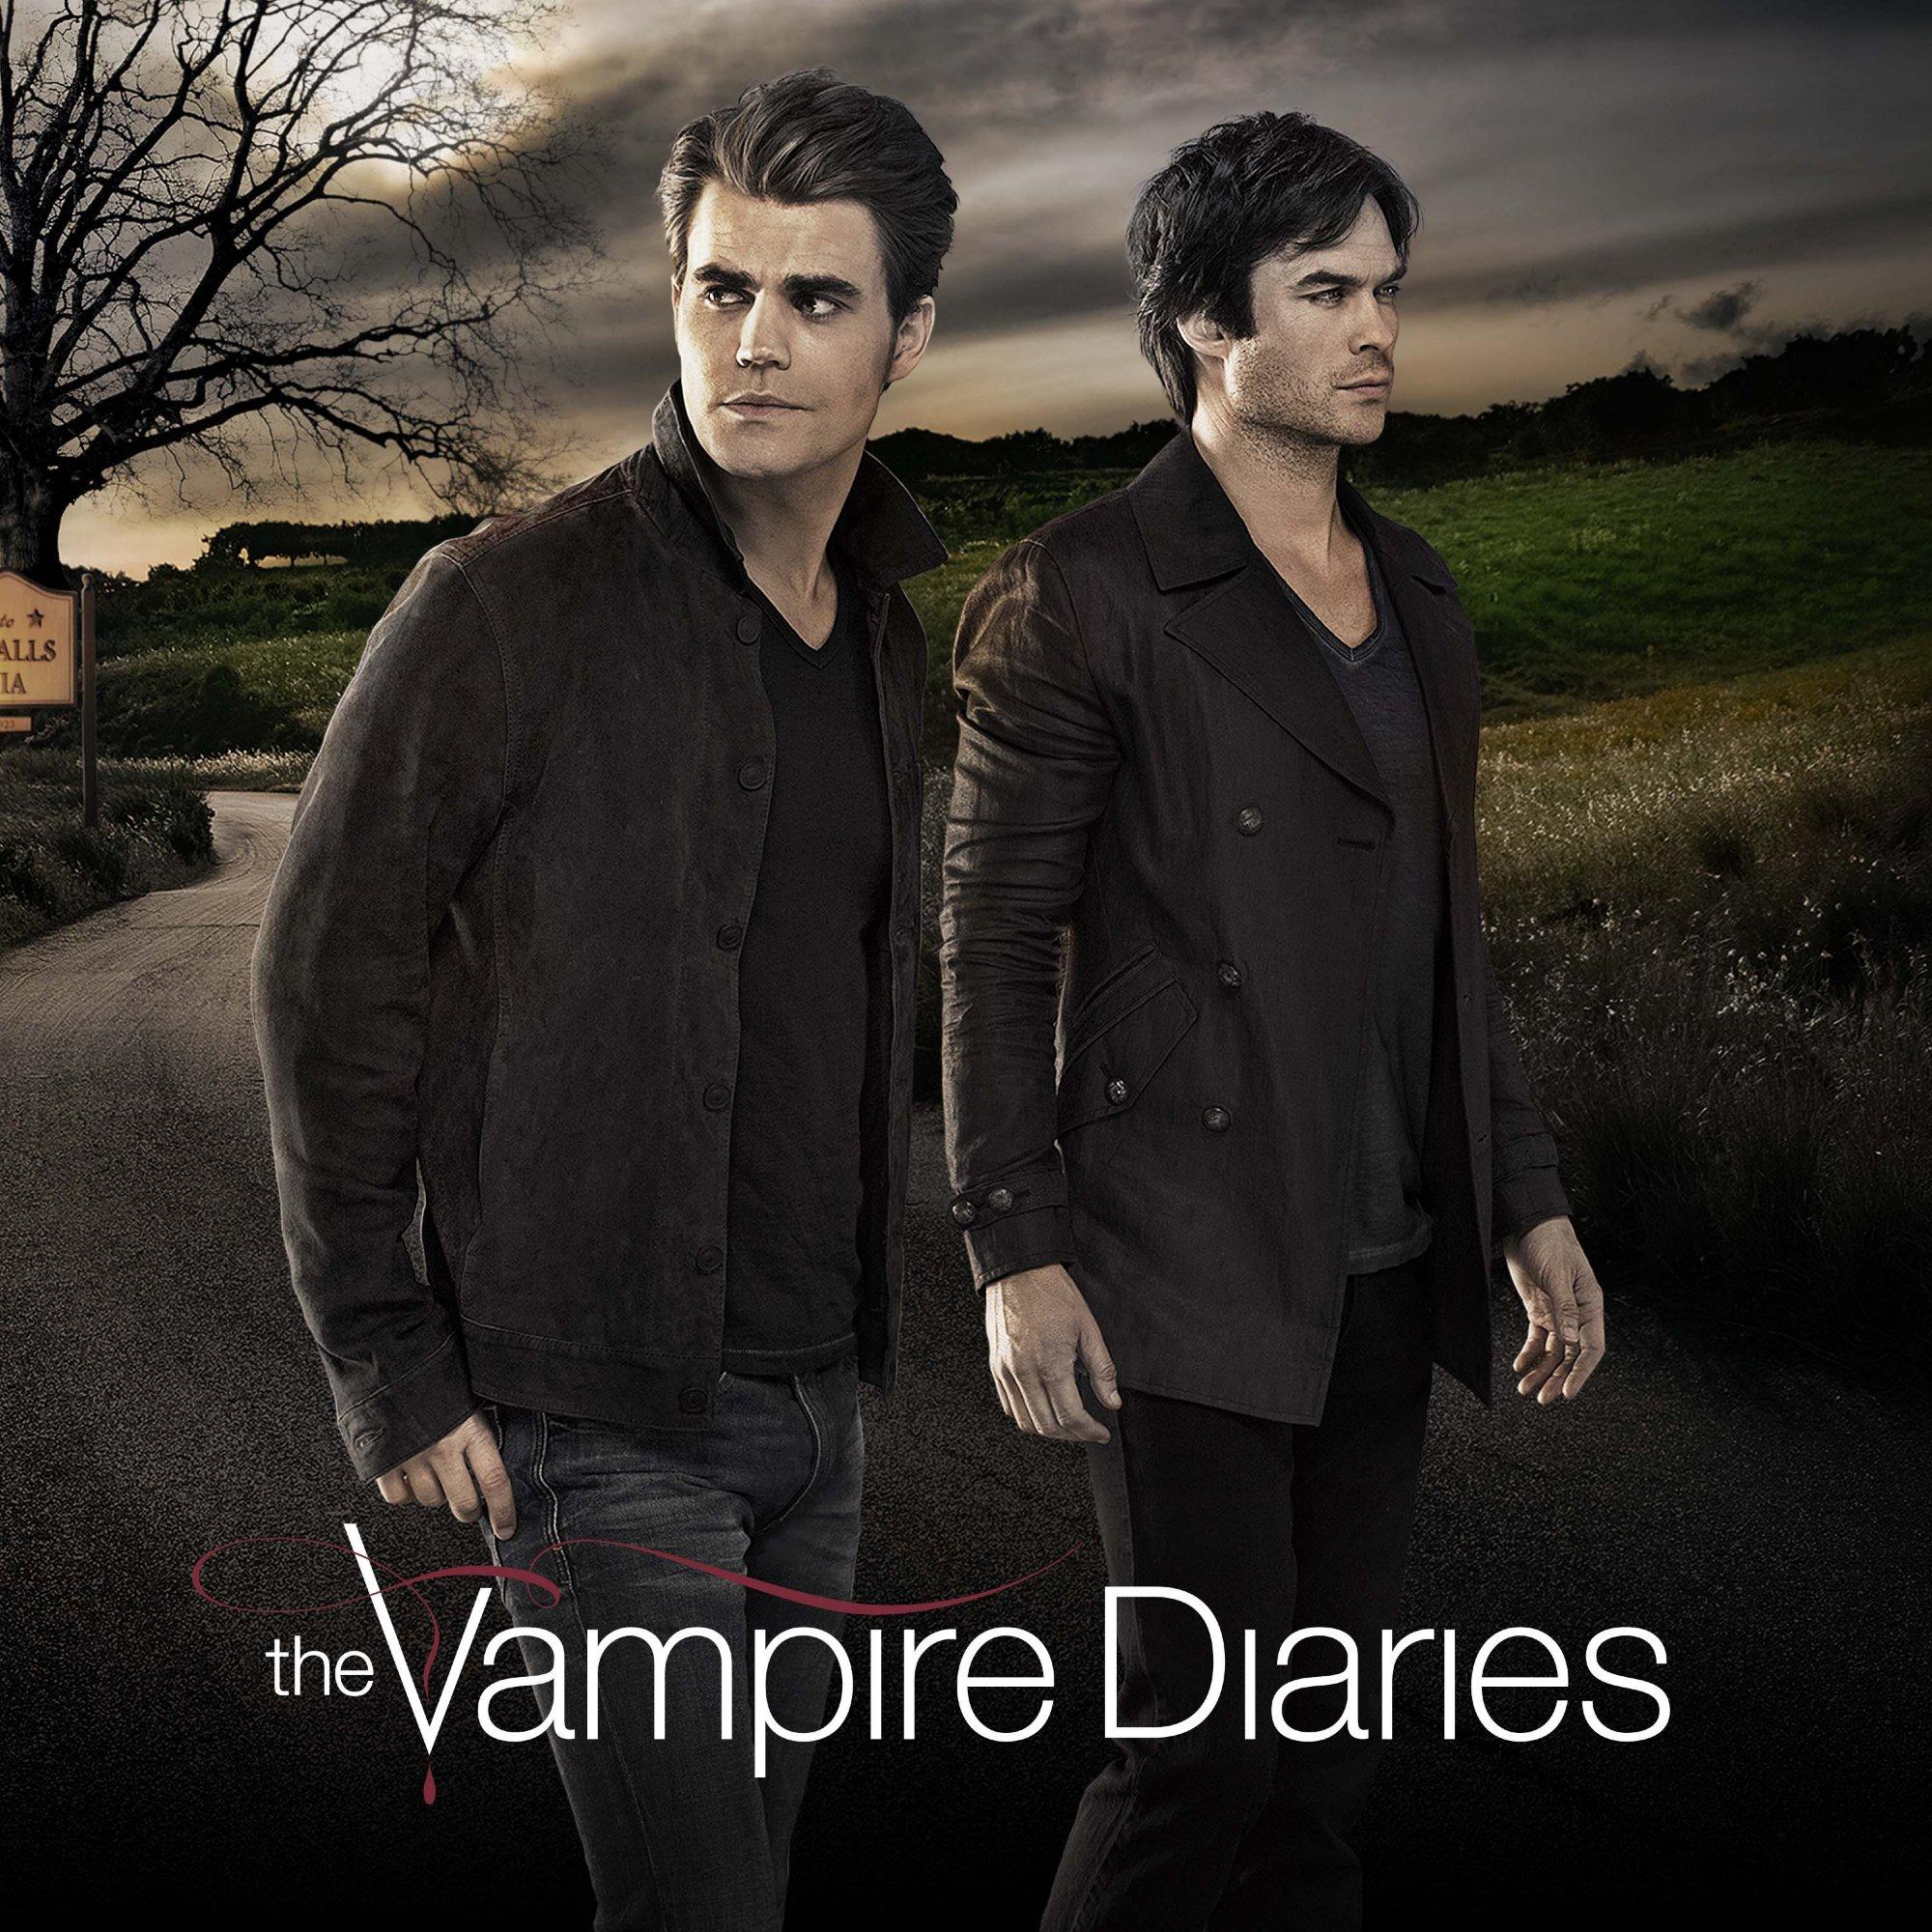 The Vampire Diaries (Subtitled)